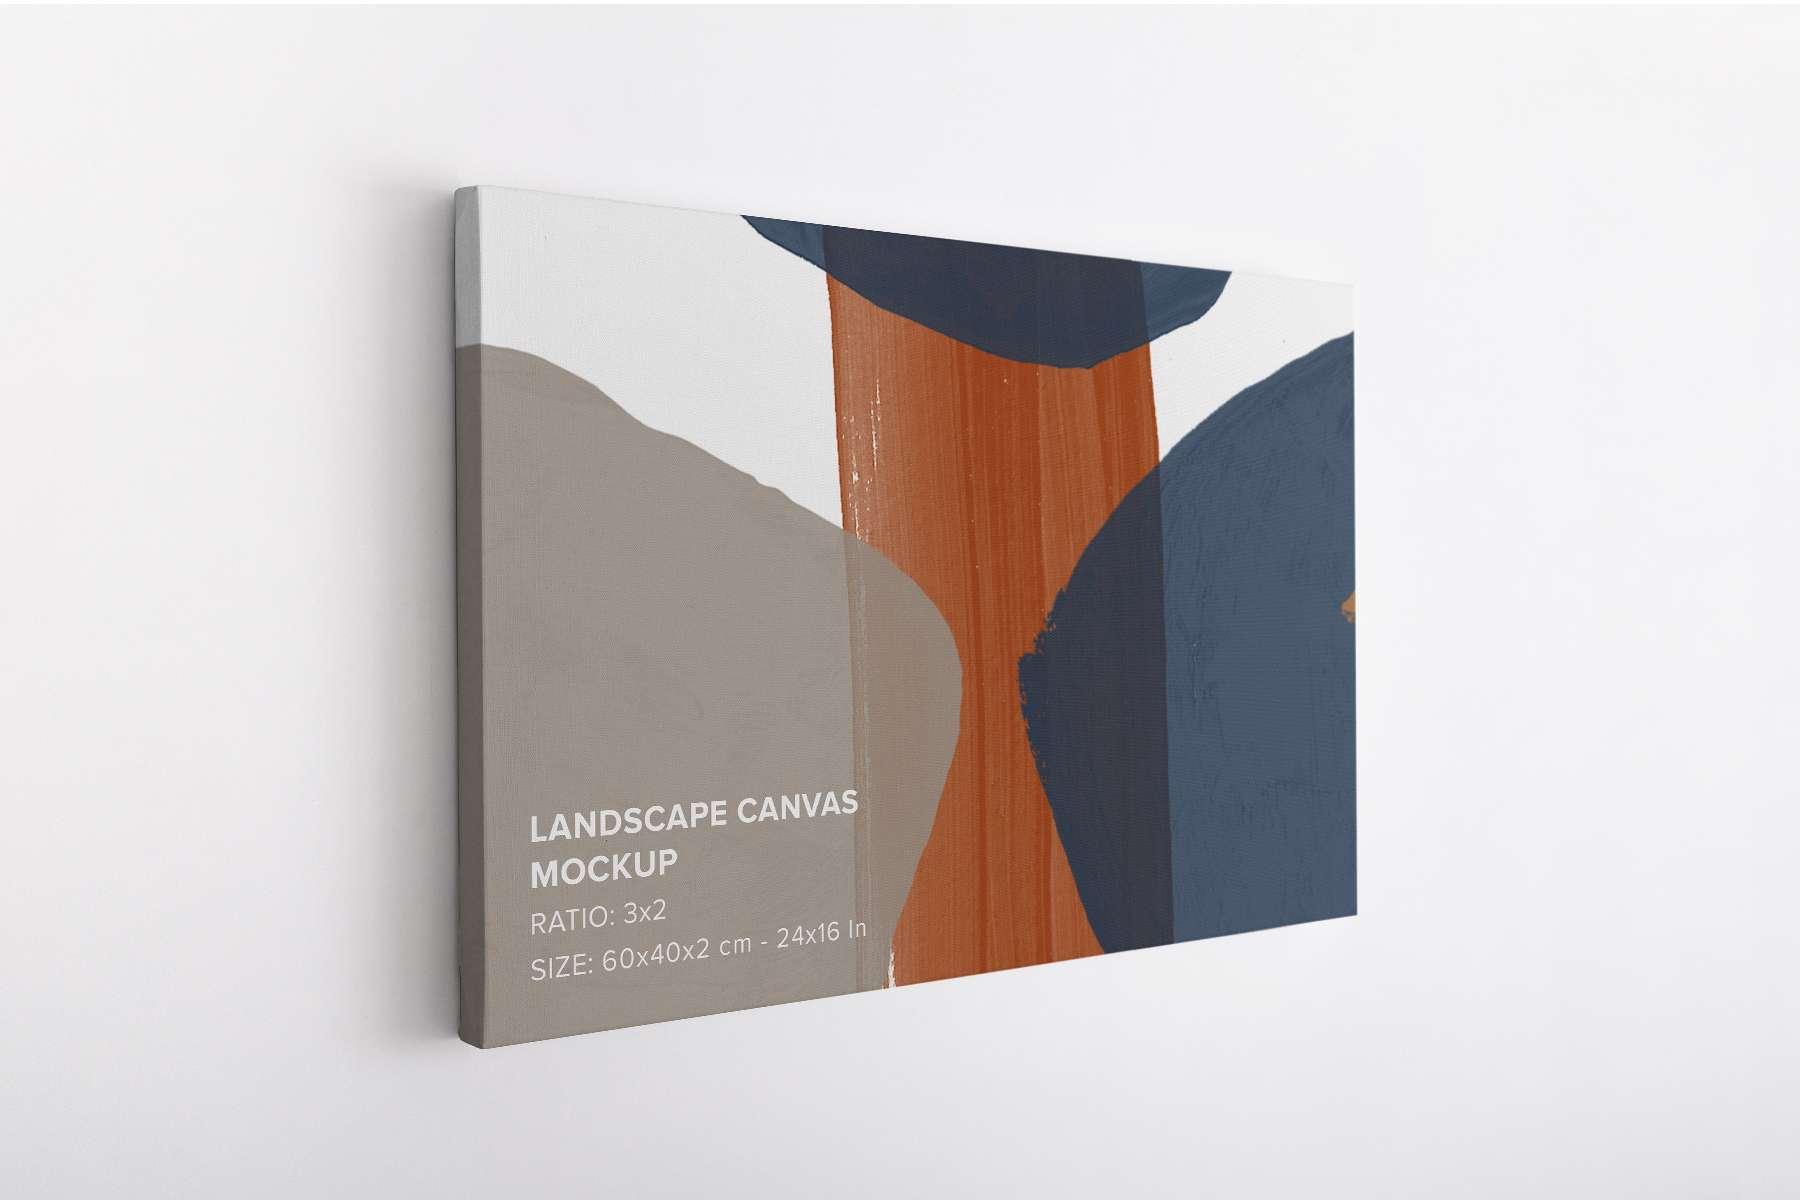 Thin Landscape Canvas Mockup